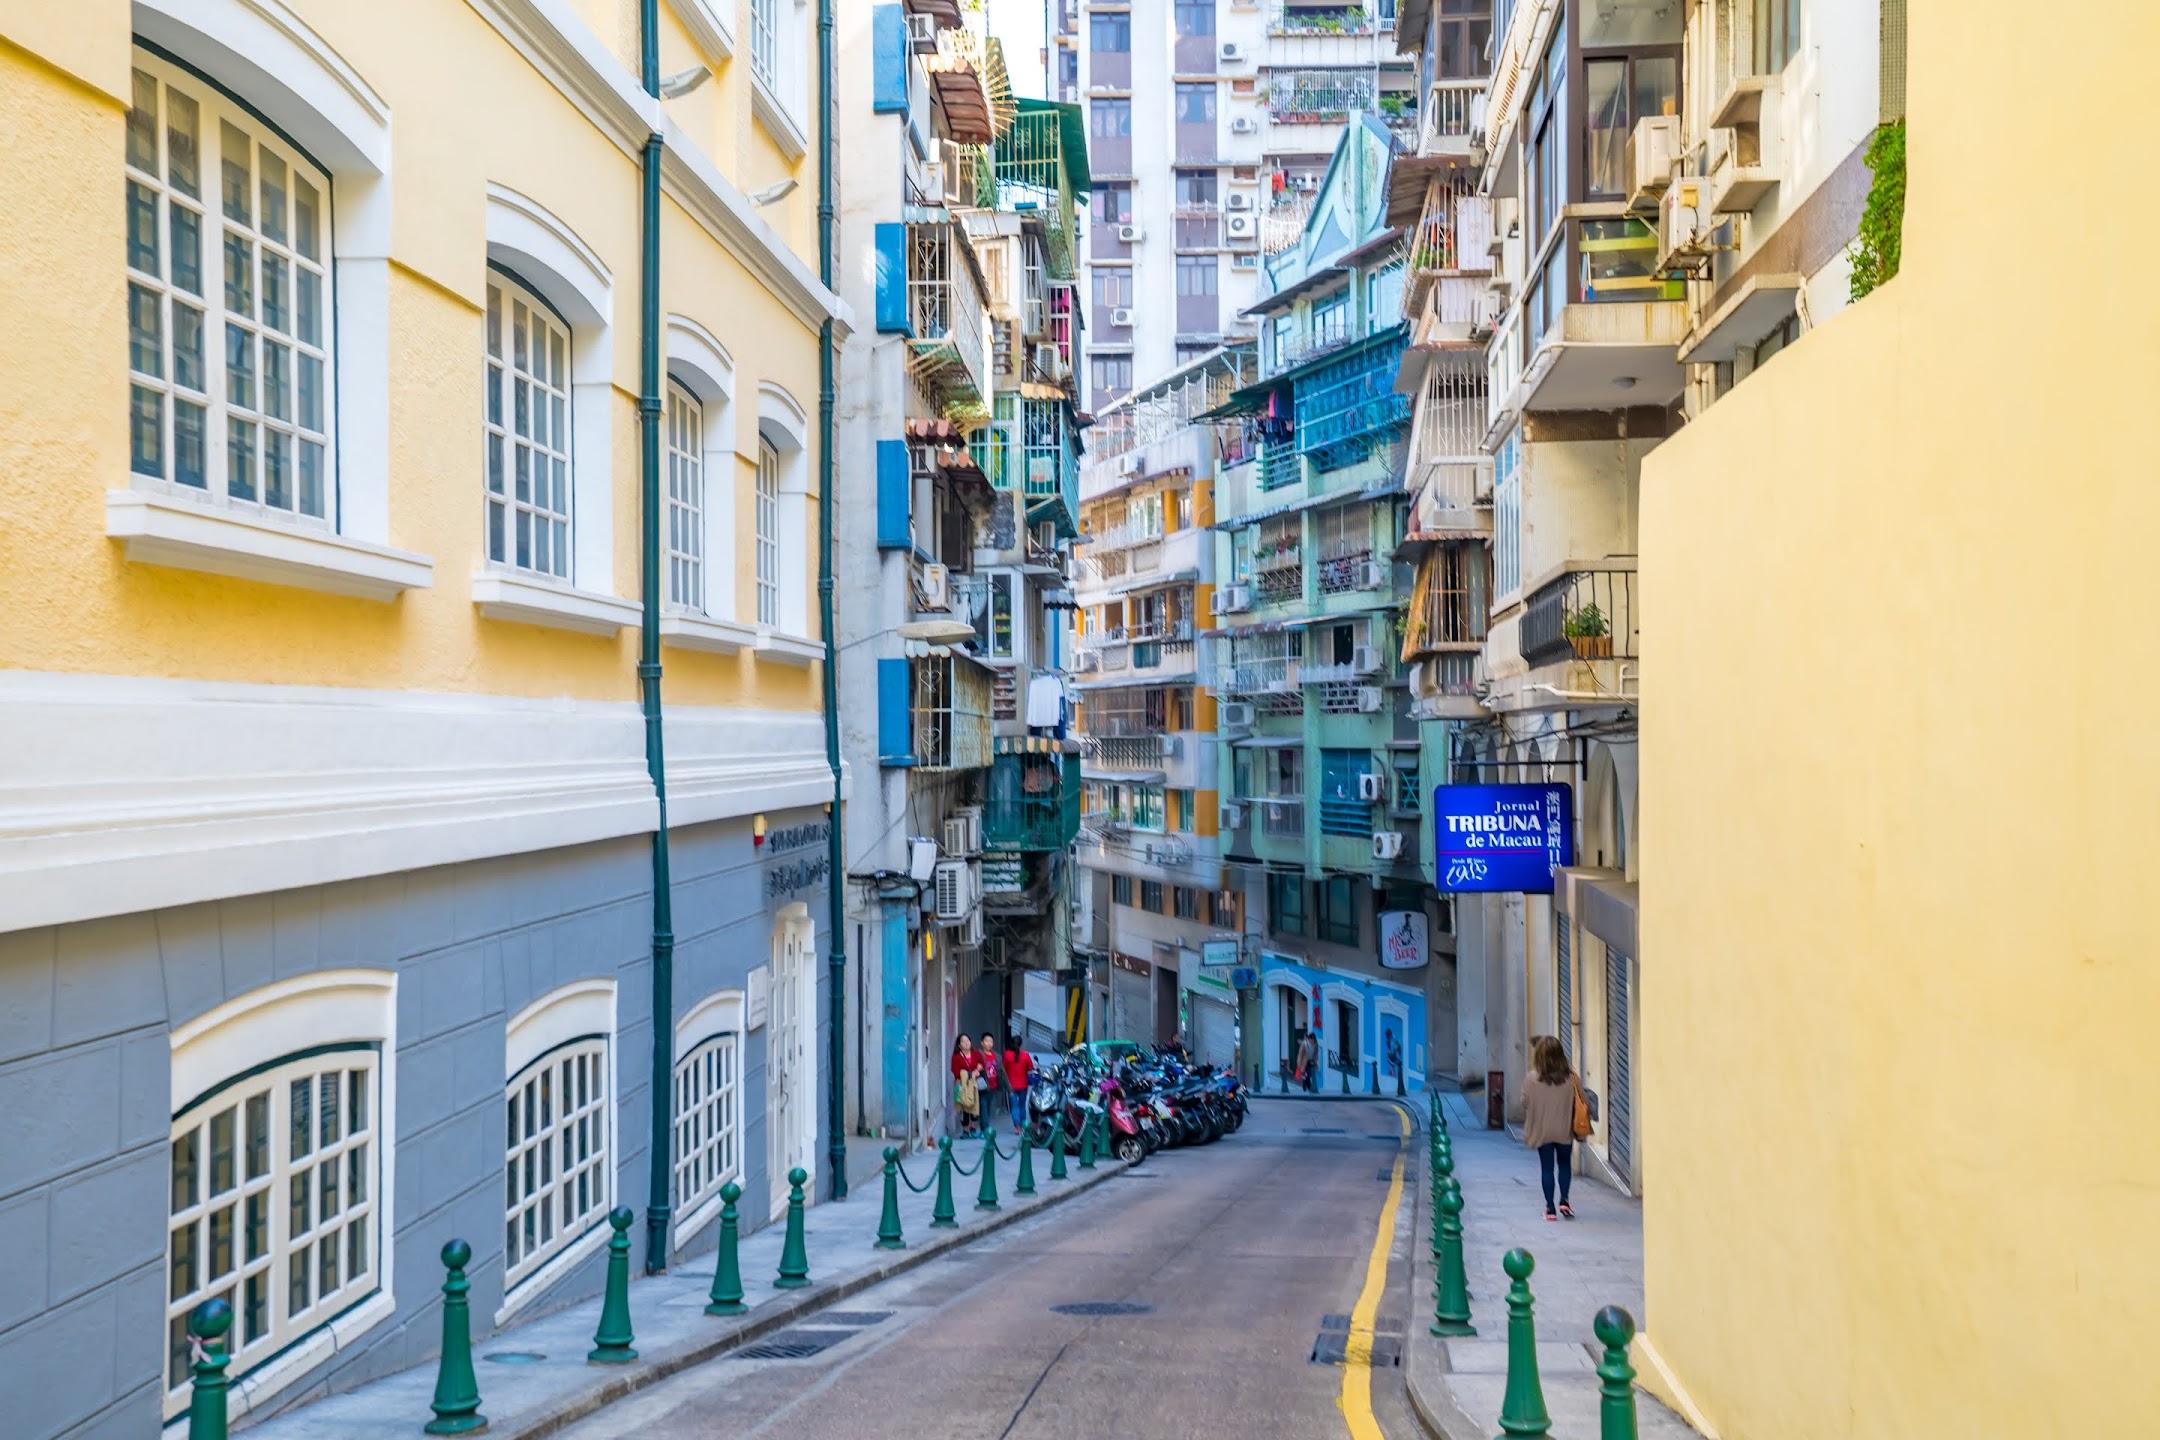 Macau off-street6